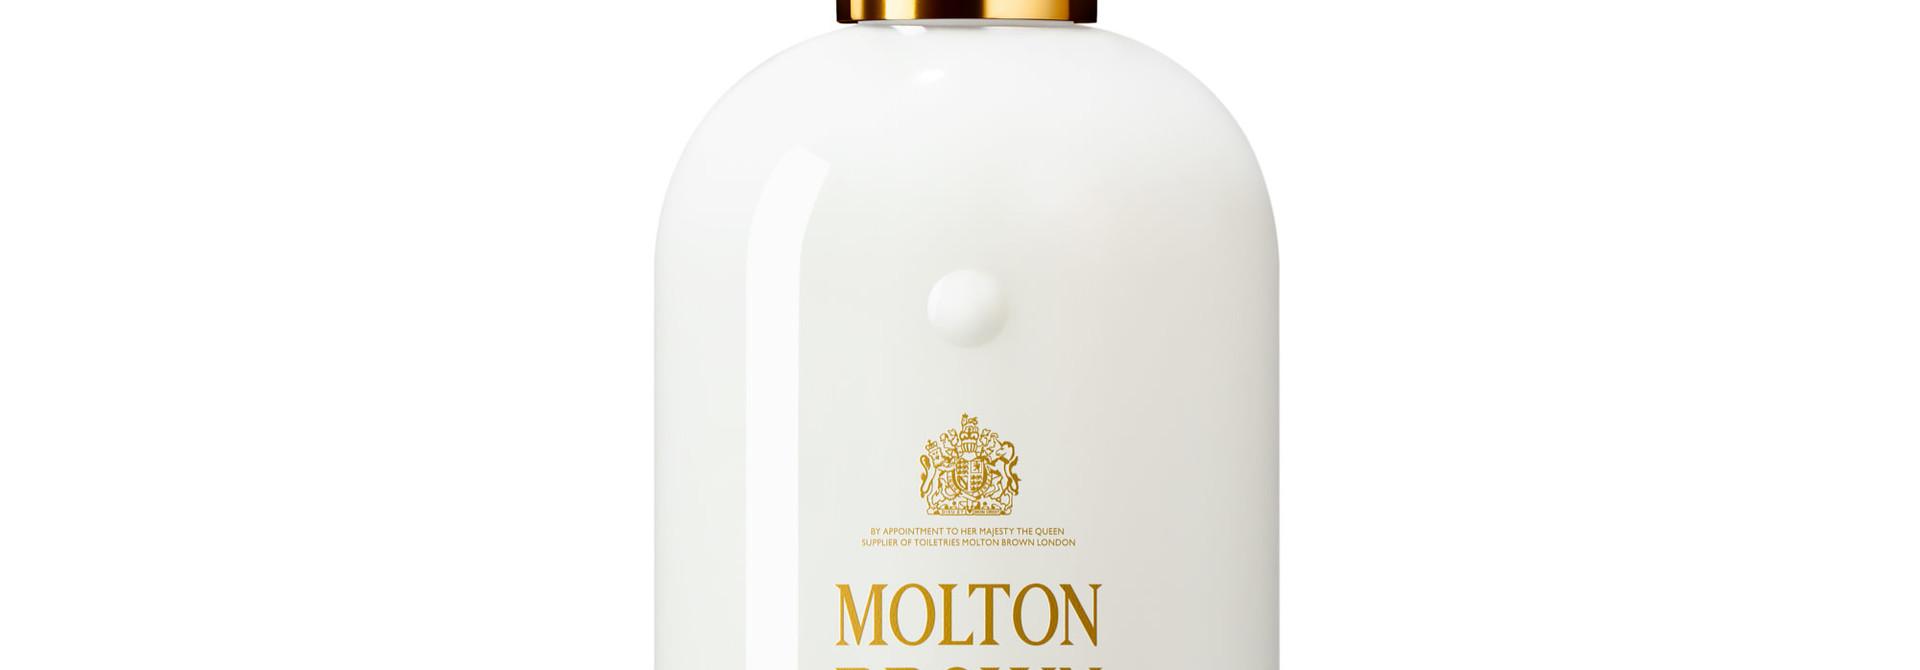 Mesmerising oudh body lotion